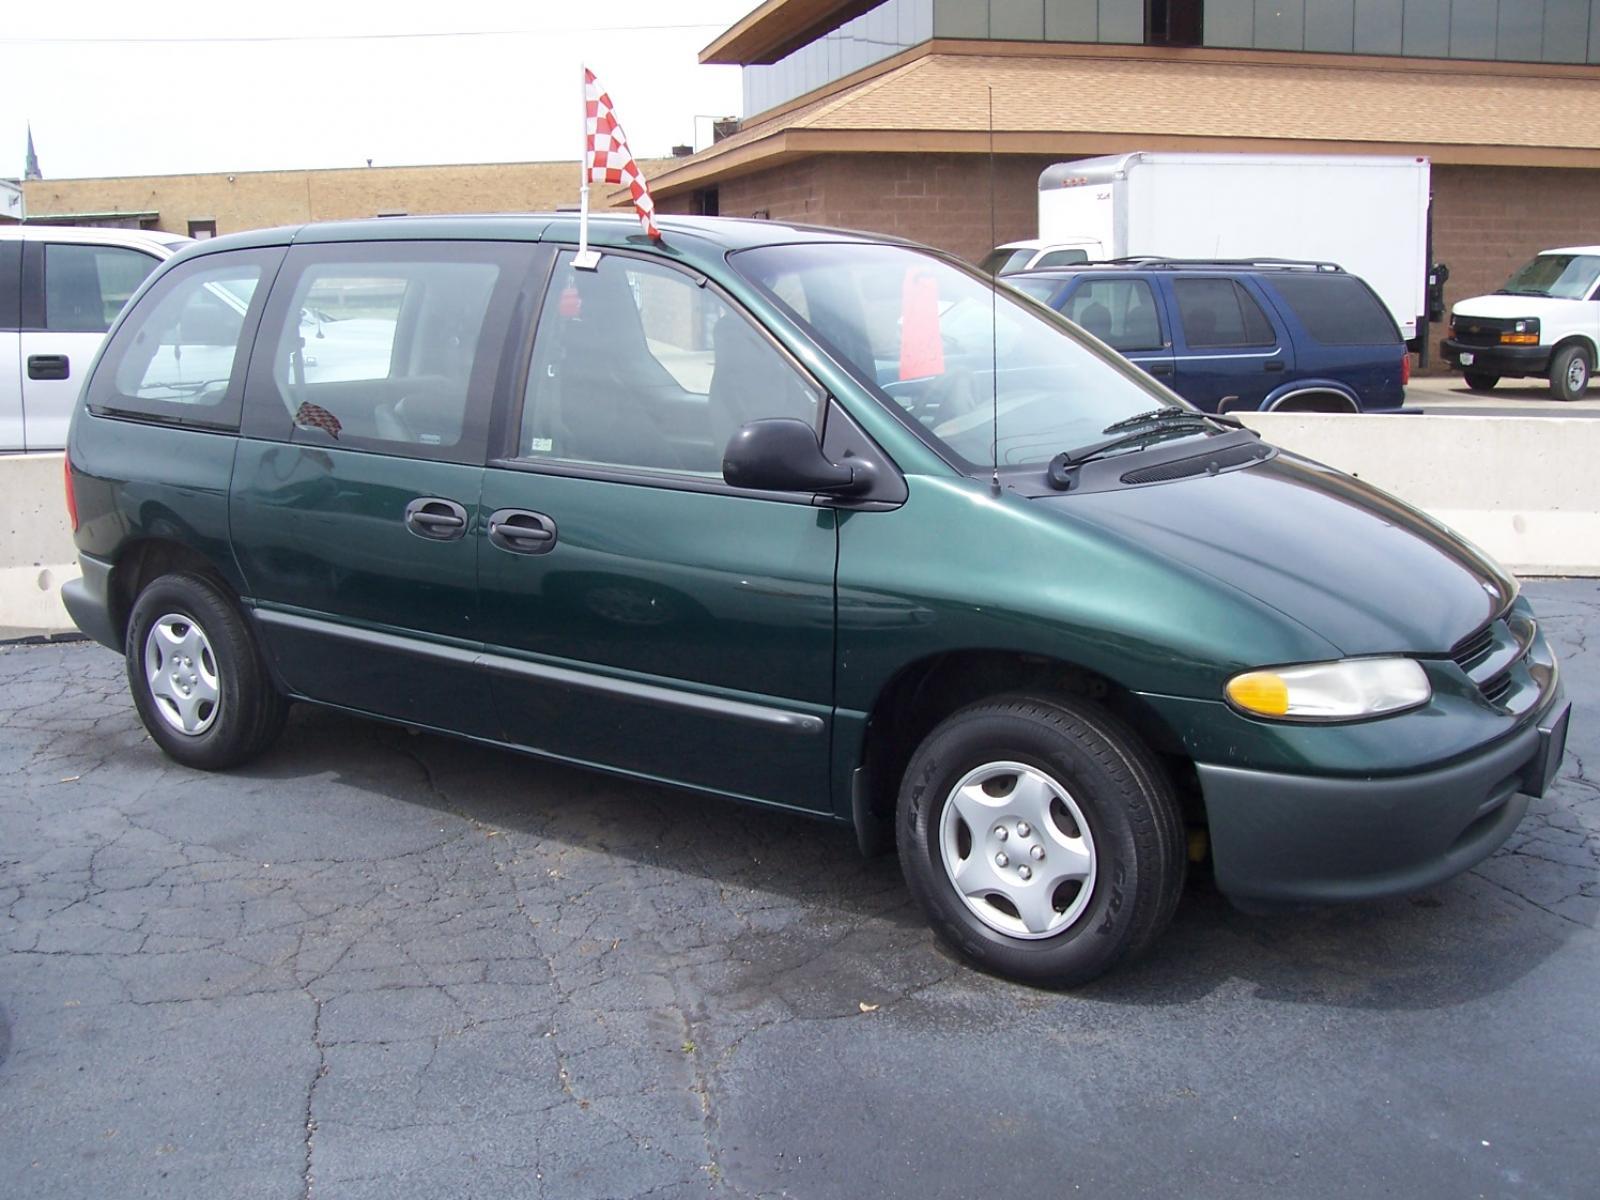 1998 Dodge Caravan 6 800 1024 1280 1600 Origin